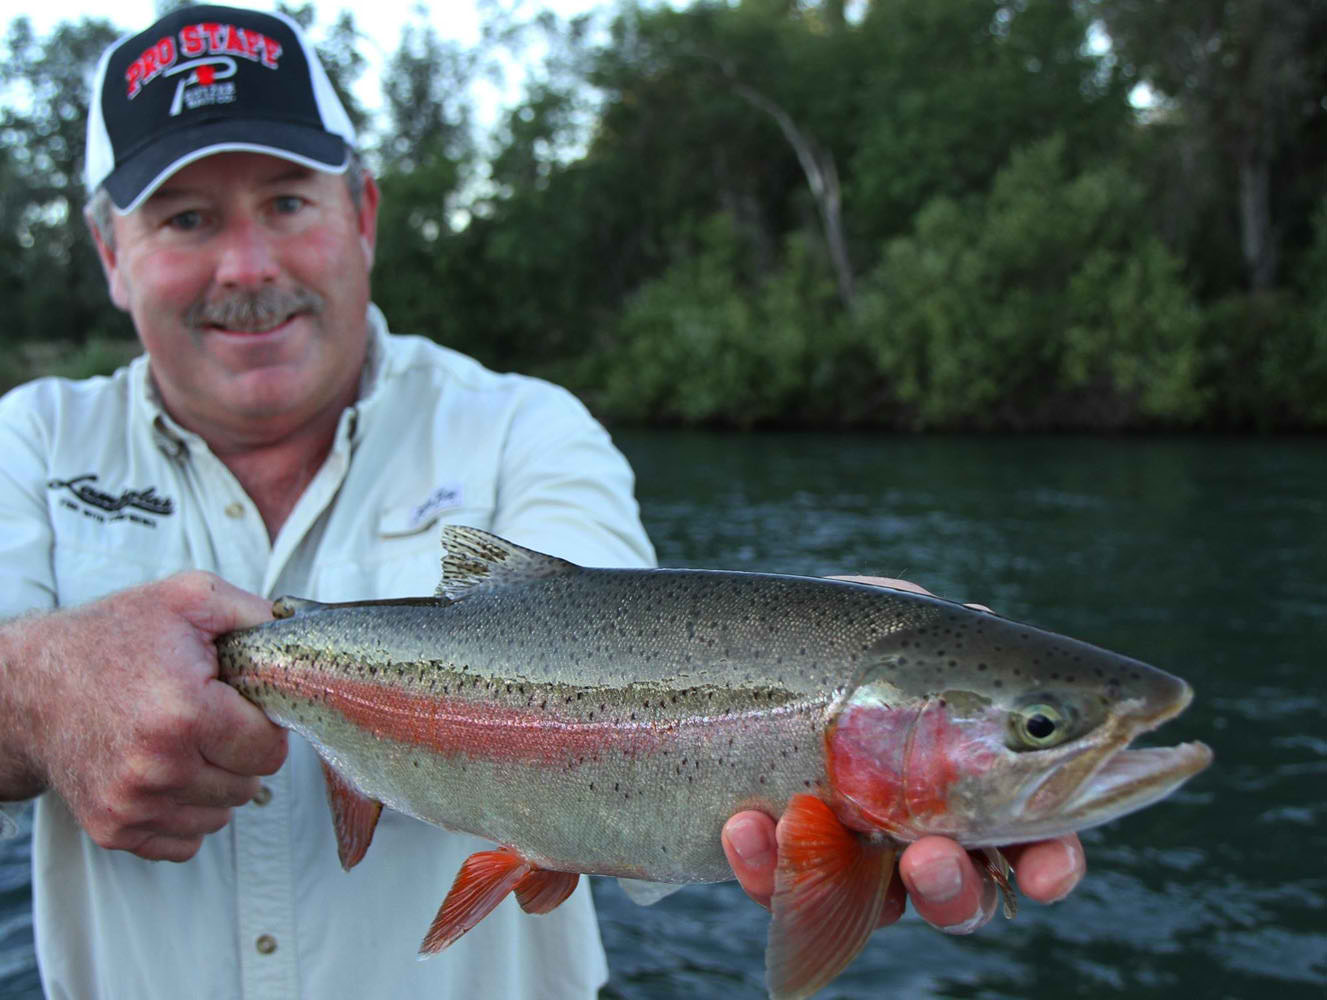 Mike Bogue Full Time Sacramento River Fishing Guide